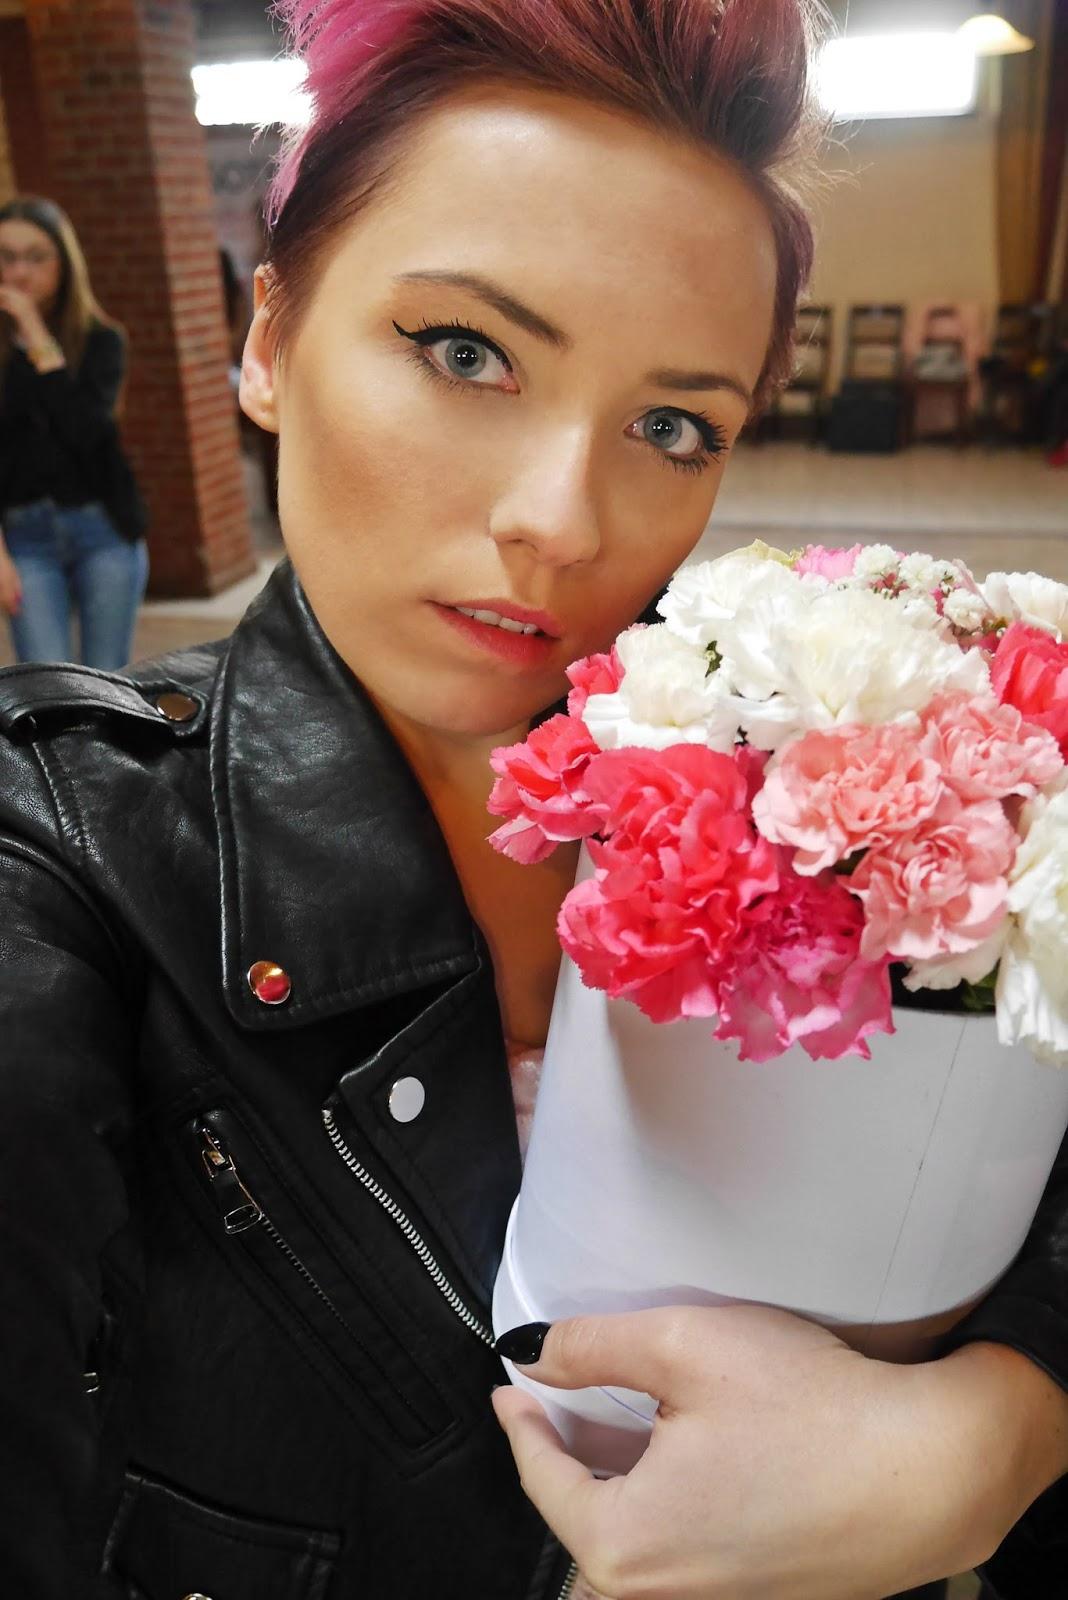 kobieca_niedziela_deblin_blogerka_MODOWA_karyn_look_ootd_240417k